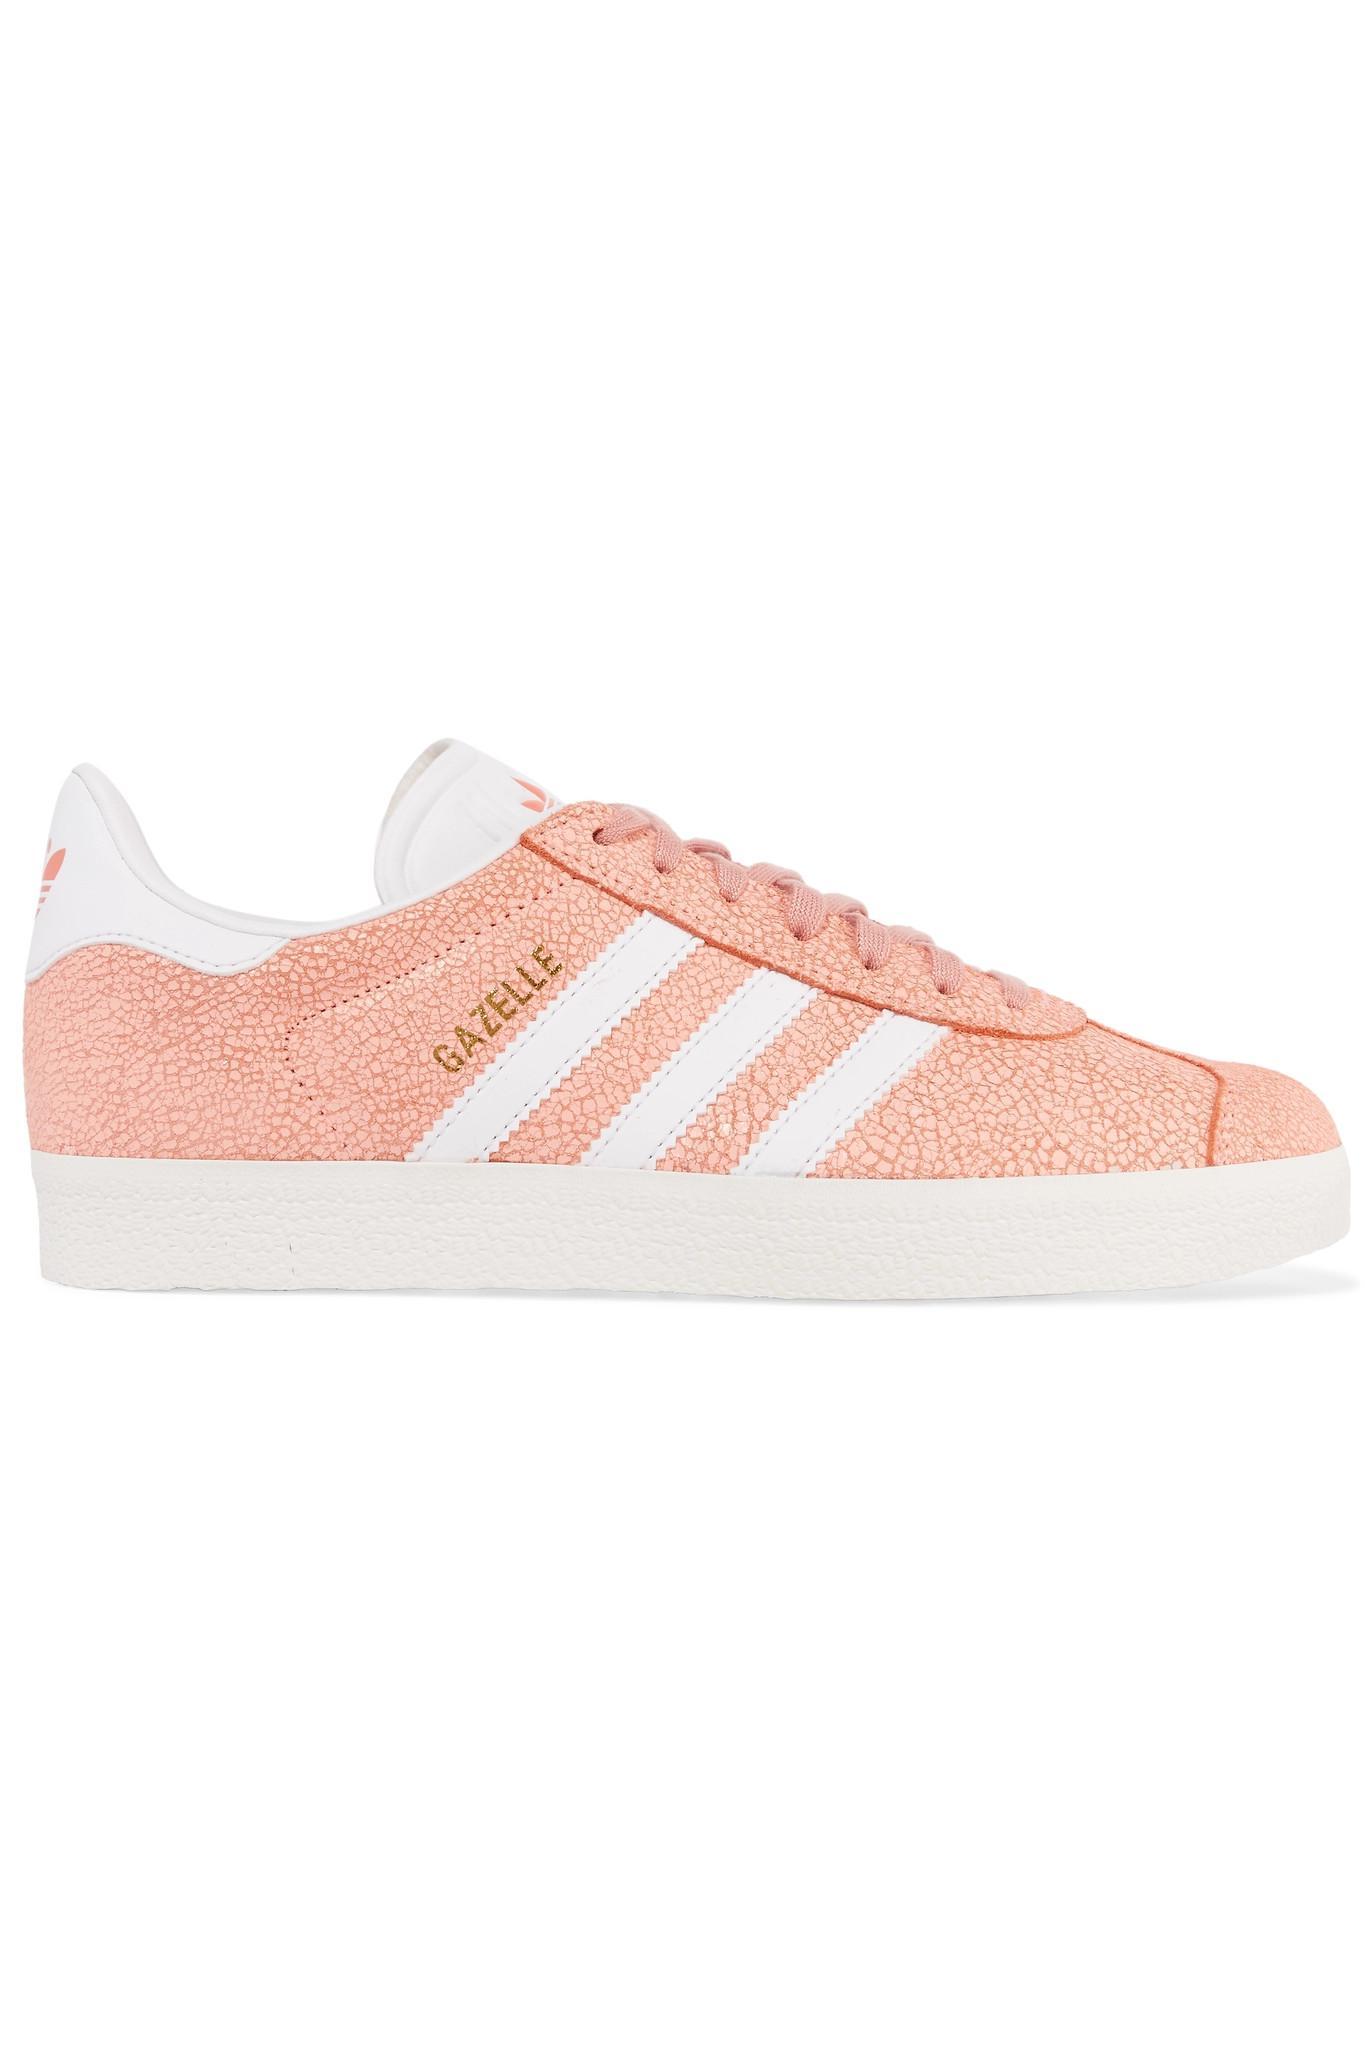 Adidas Originals - Pink Gazelle Cracked-suede Sneakers - Lyst. View  fullscreen 5eab0b414